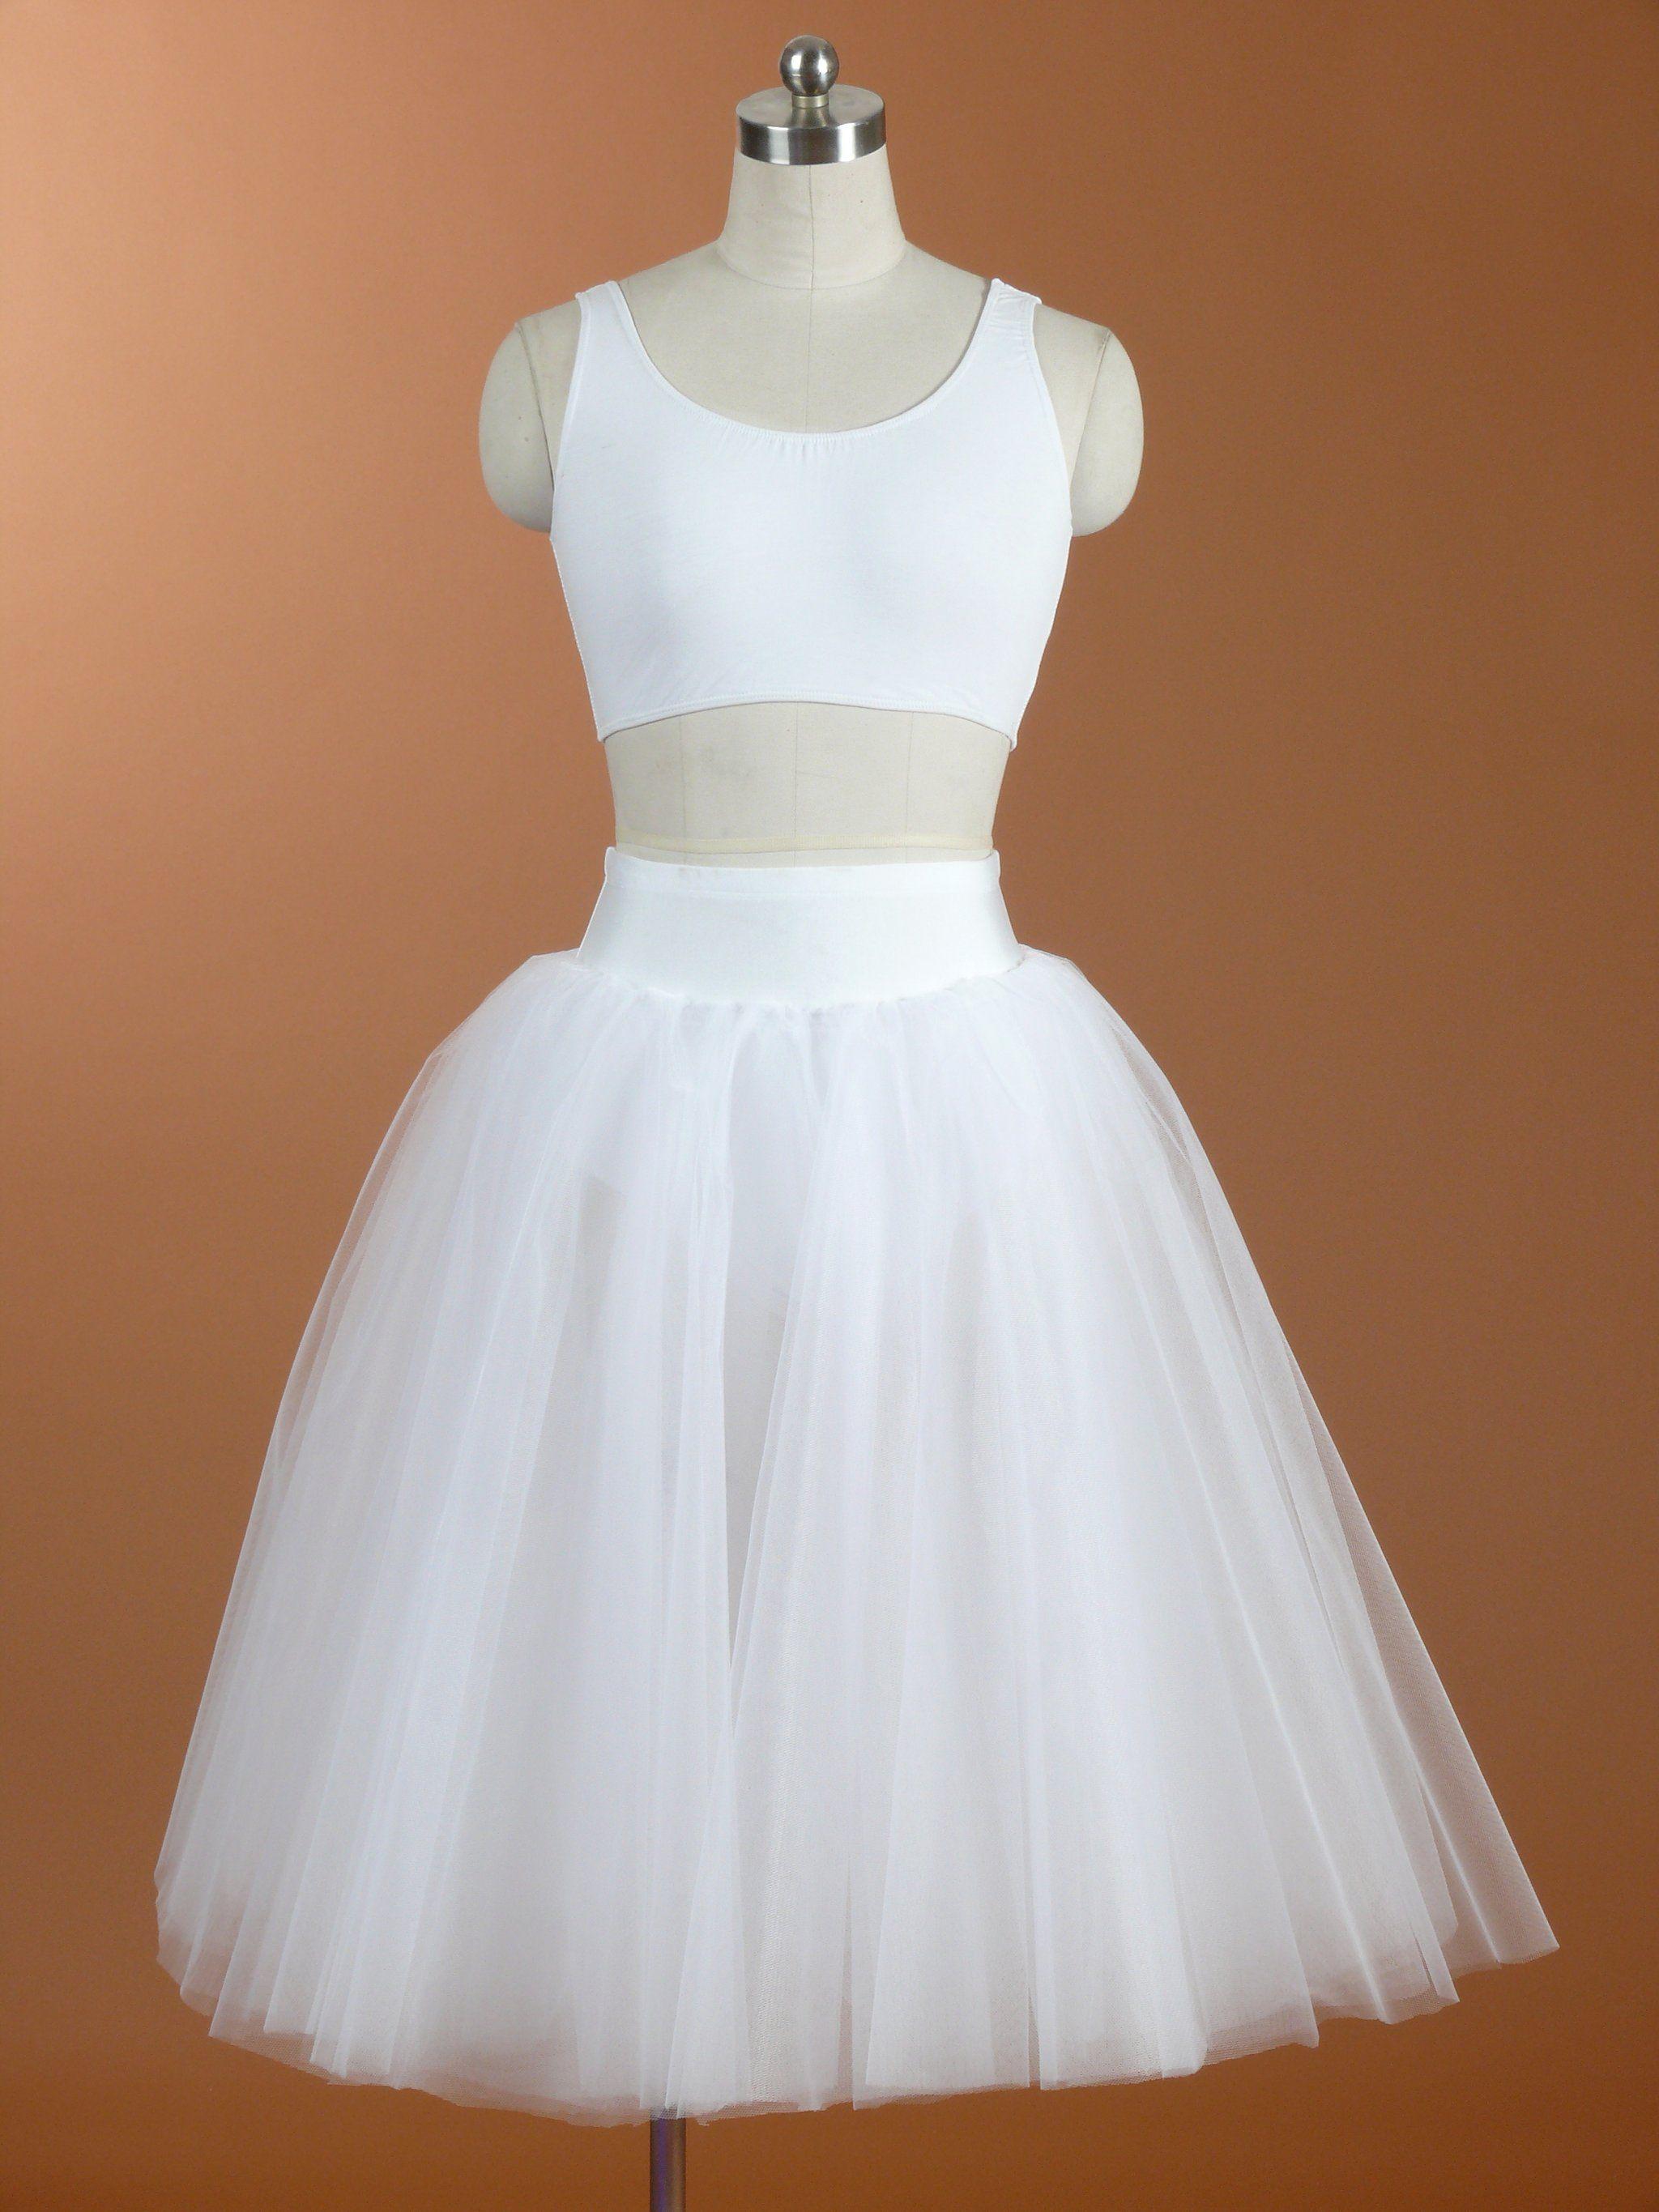 Long Romantic Tutu Skirt Long Tutu Skirt Dance Outfits Diy Tulle Skirt [ 2731 x 2048 Pixel ]